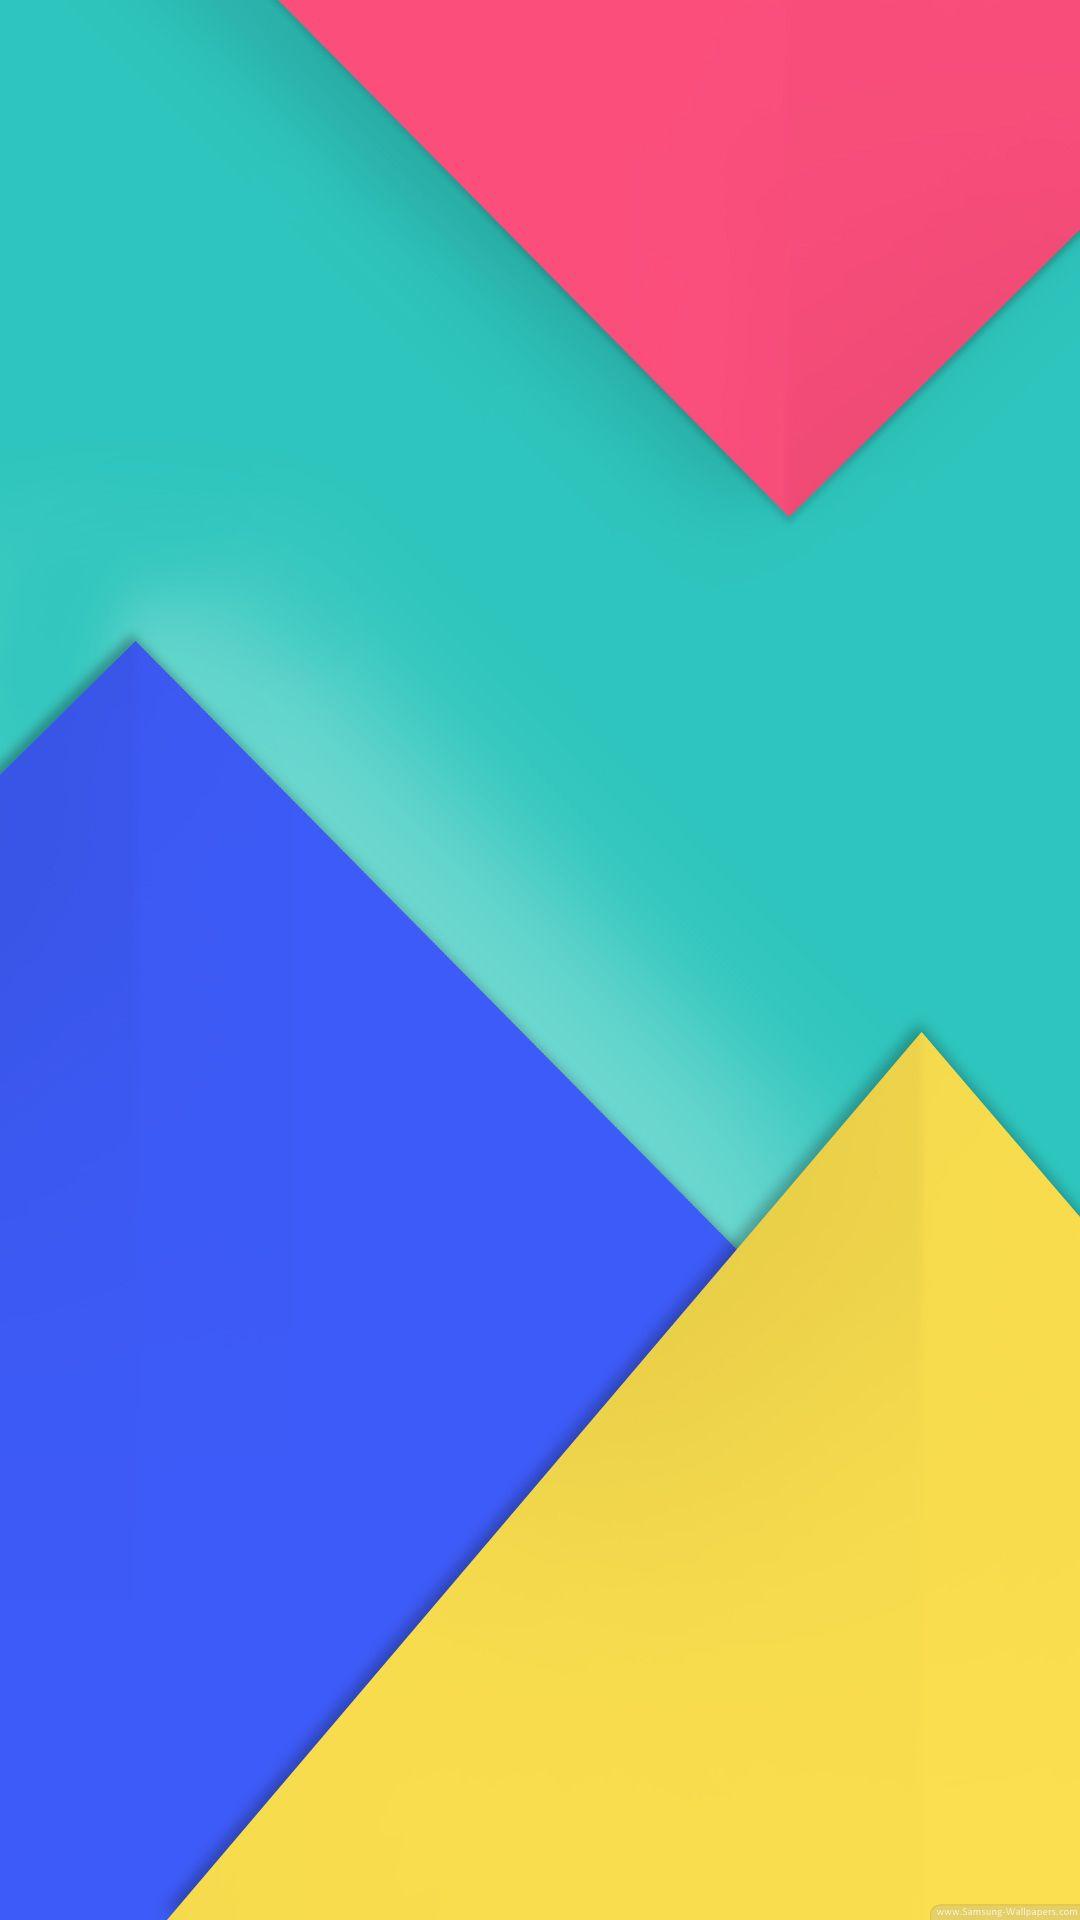 Galagy Tab live wallpaper iPhone